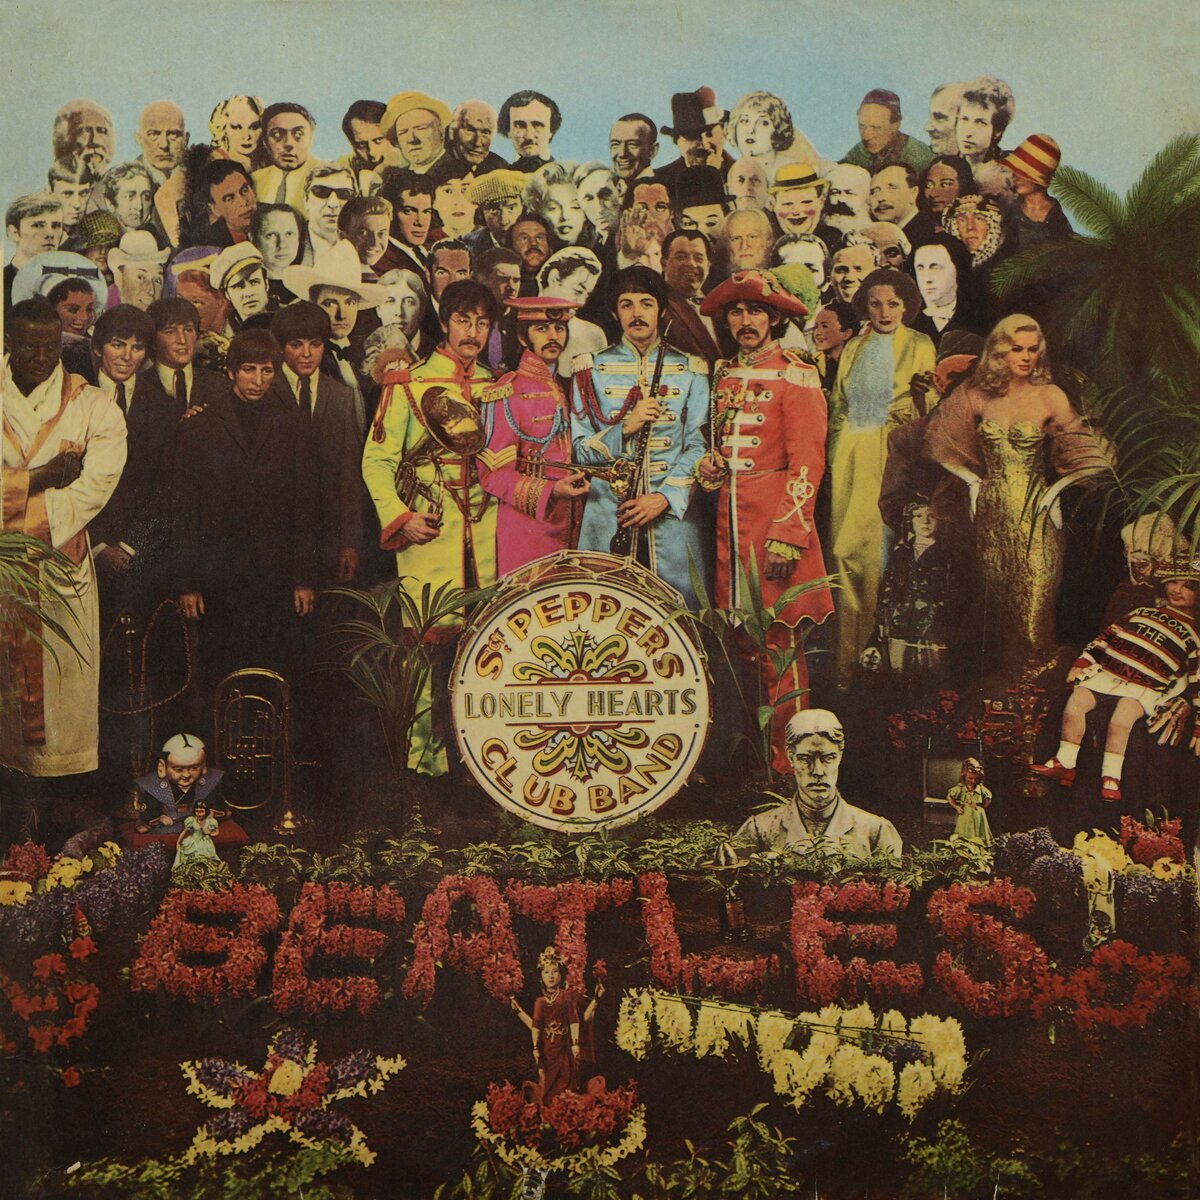 The Beatles — Sgt. Pepper's Lonely Hearts Club Band,1967 год, слушать онлайн, скачать альбом в mp3